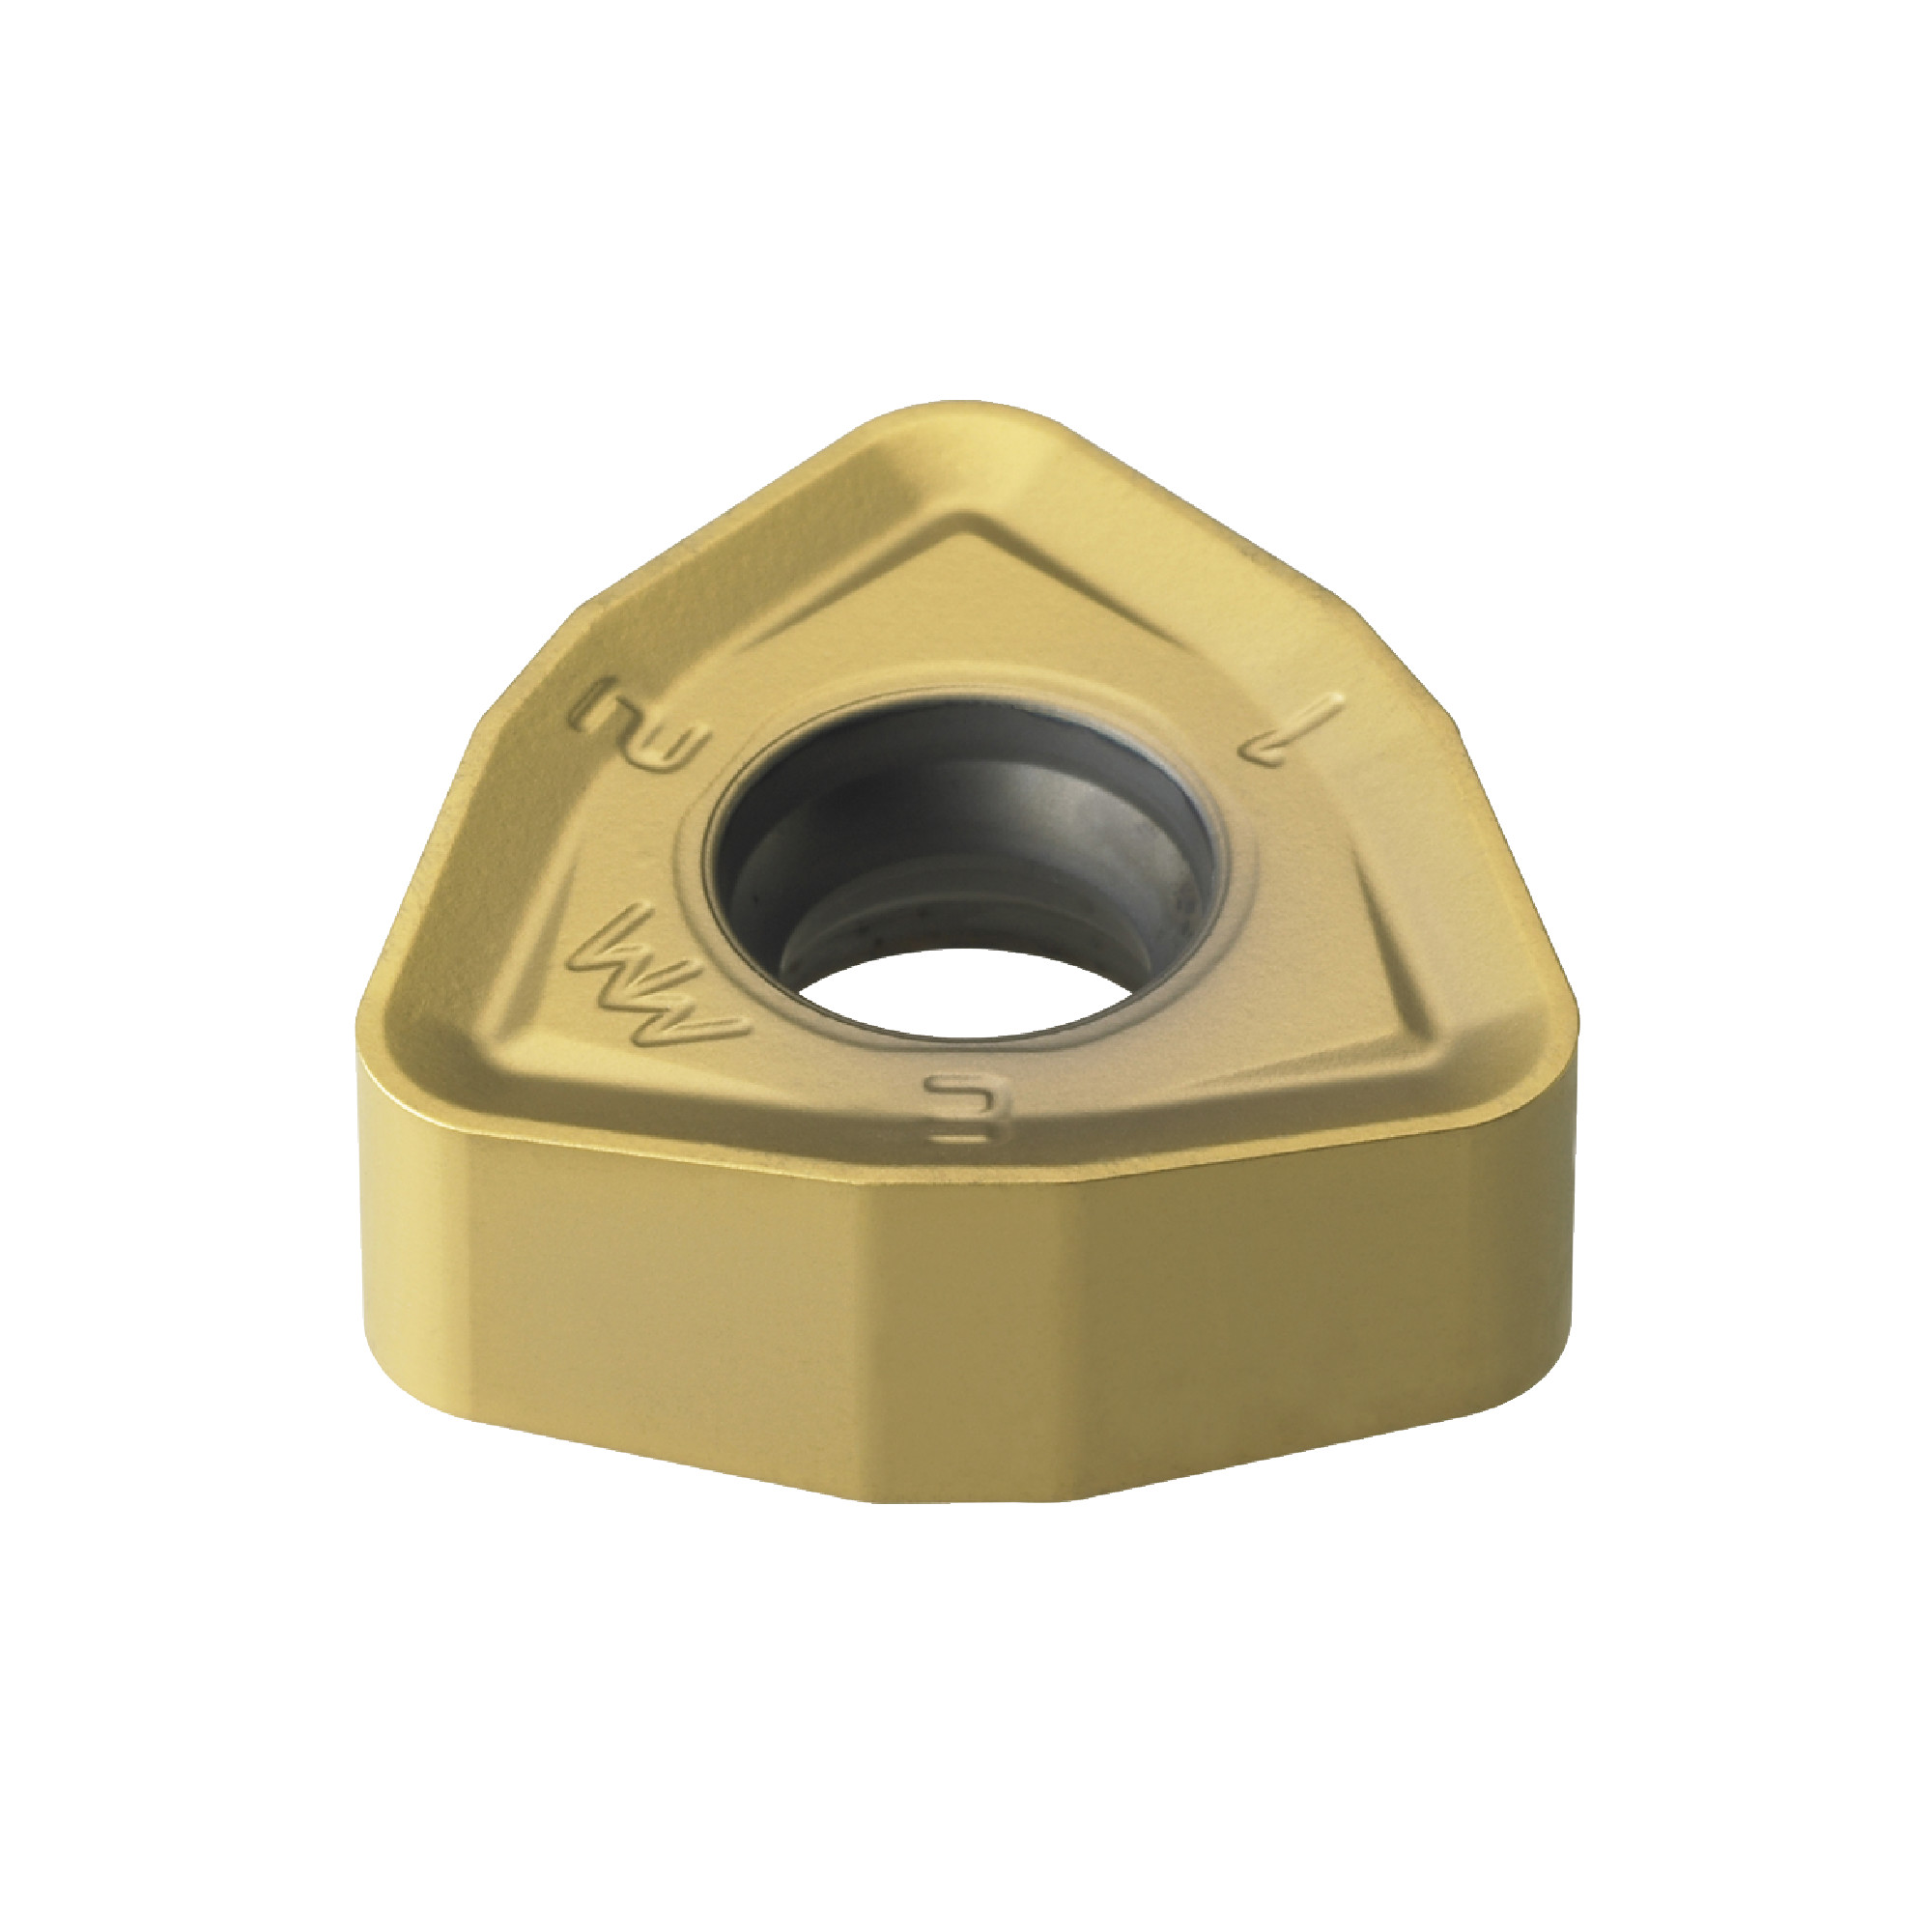 KORLOY - WNMX060312ZNN-MM PC3500 Trigon / INDEXABLE Carbide MILLING INSERT